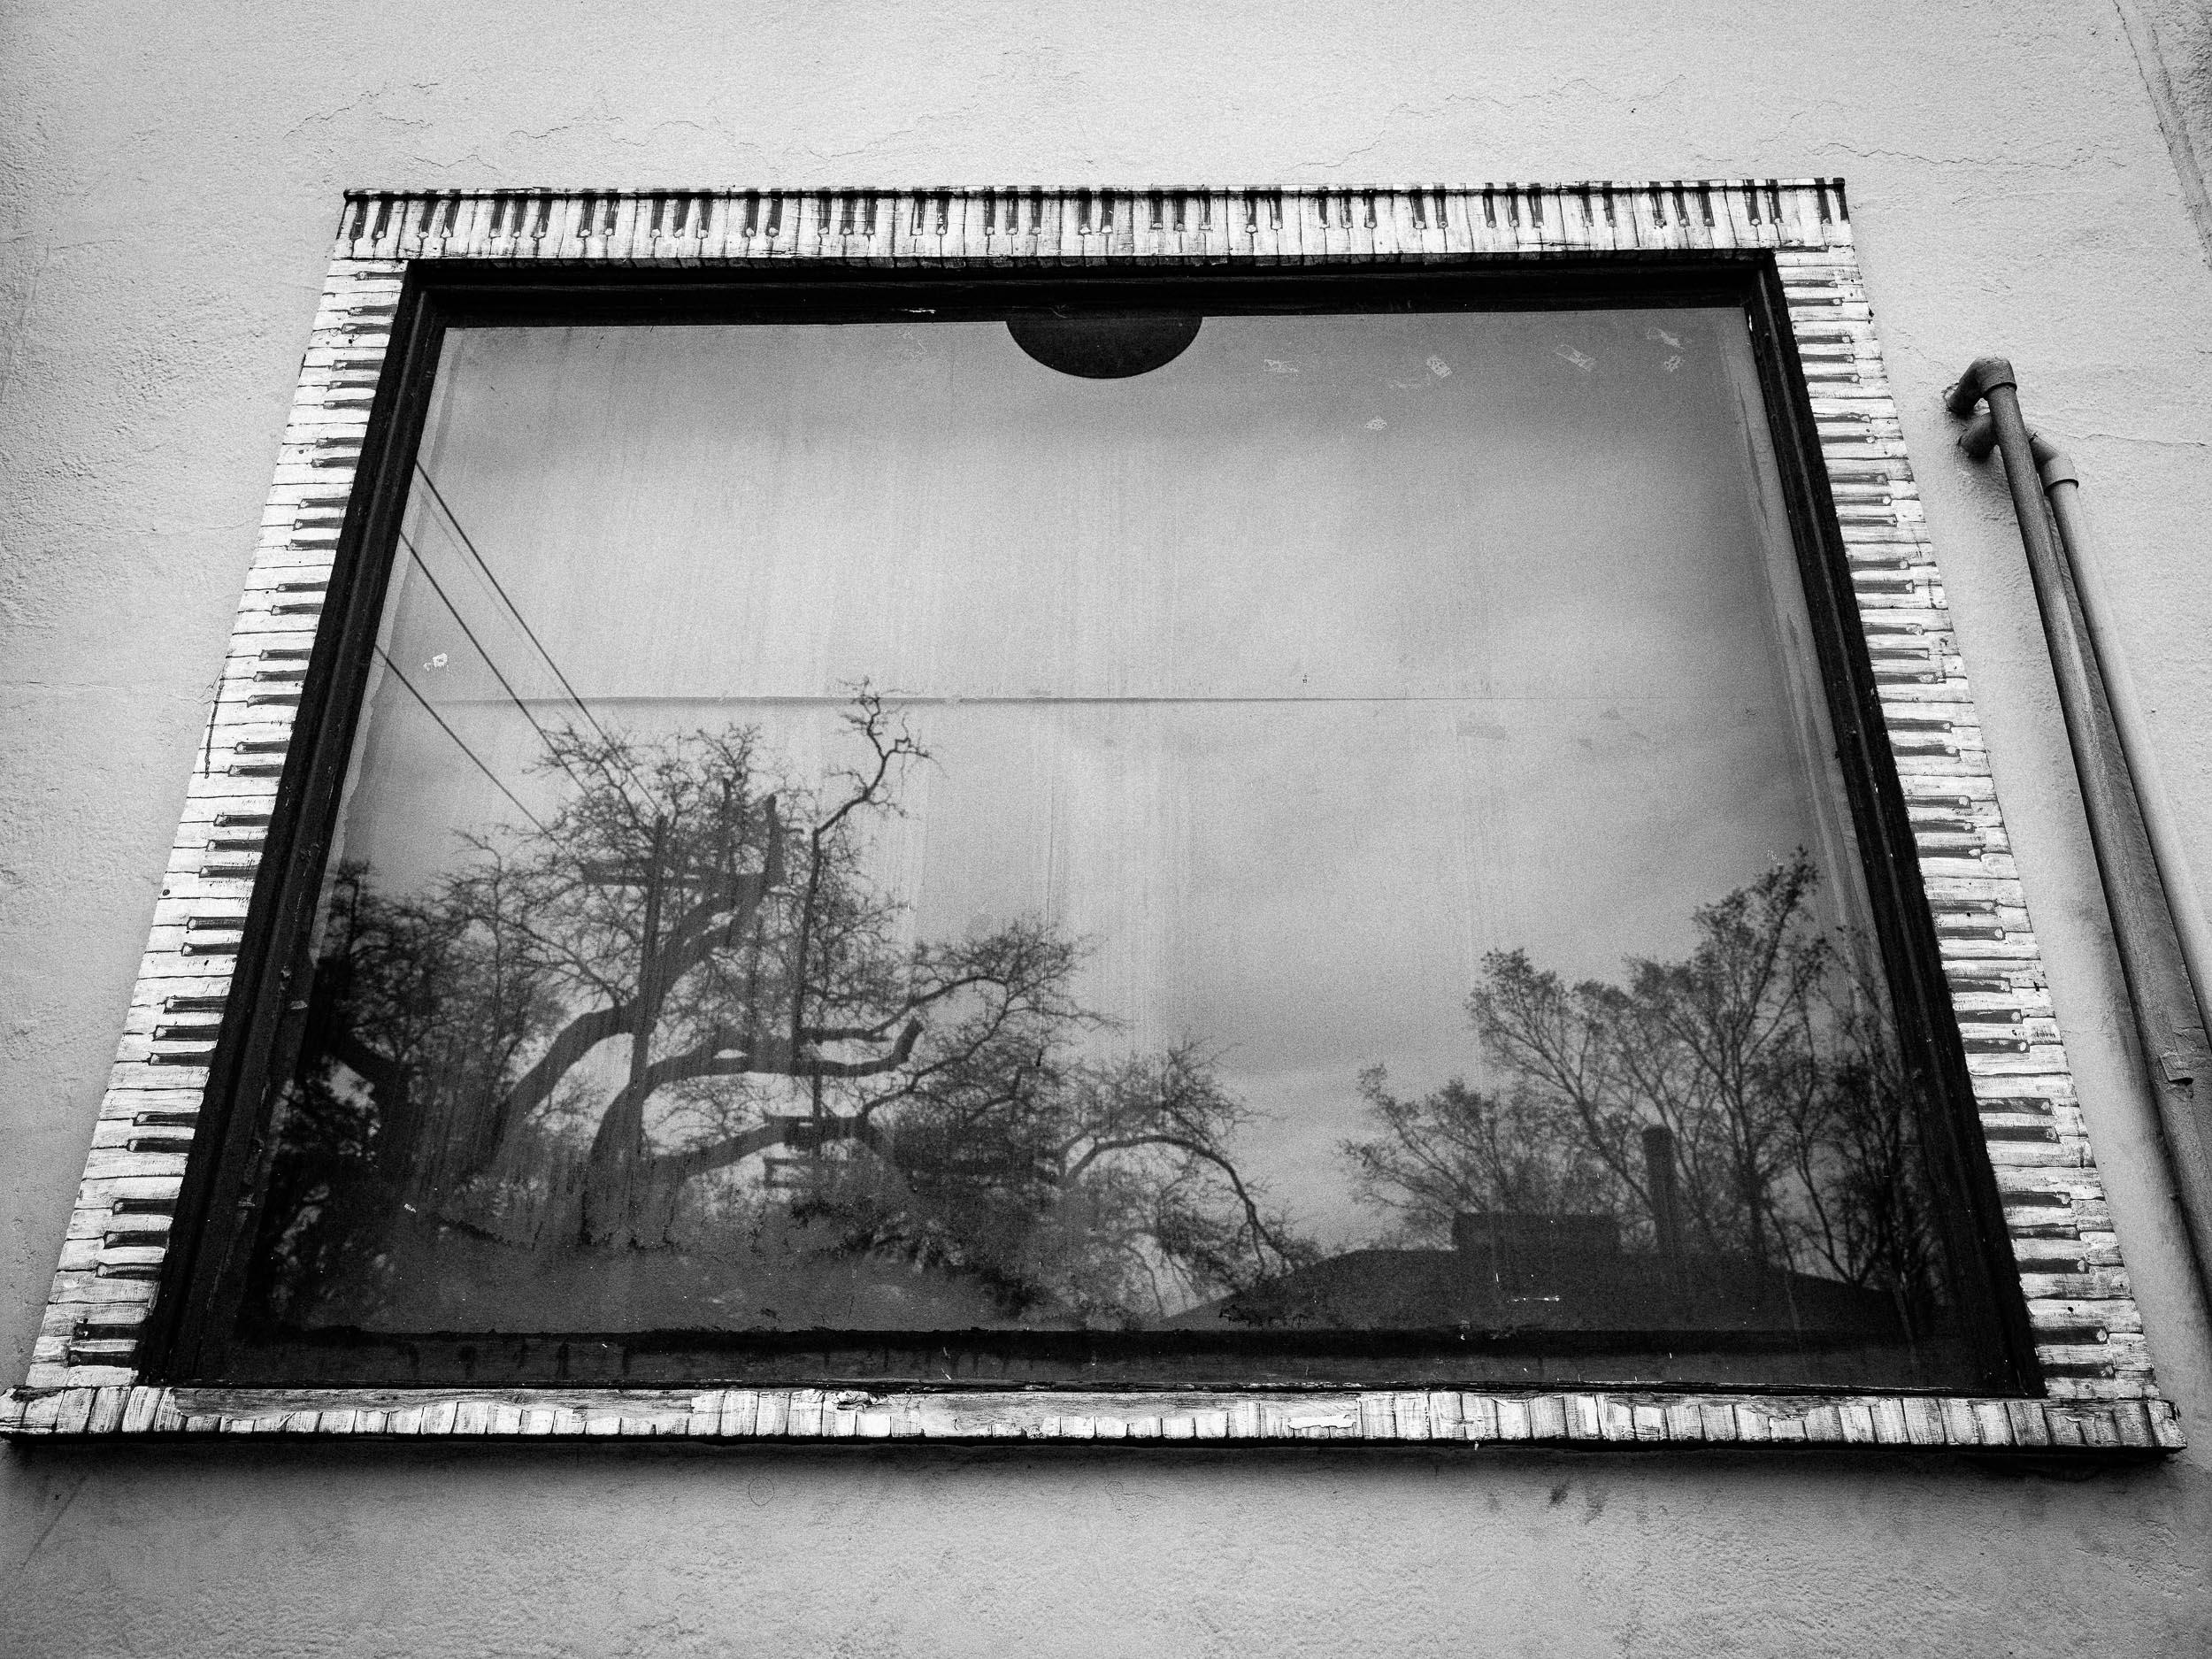 Tipitina's Window